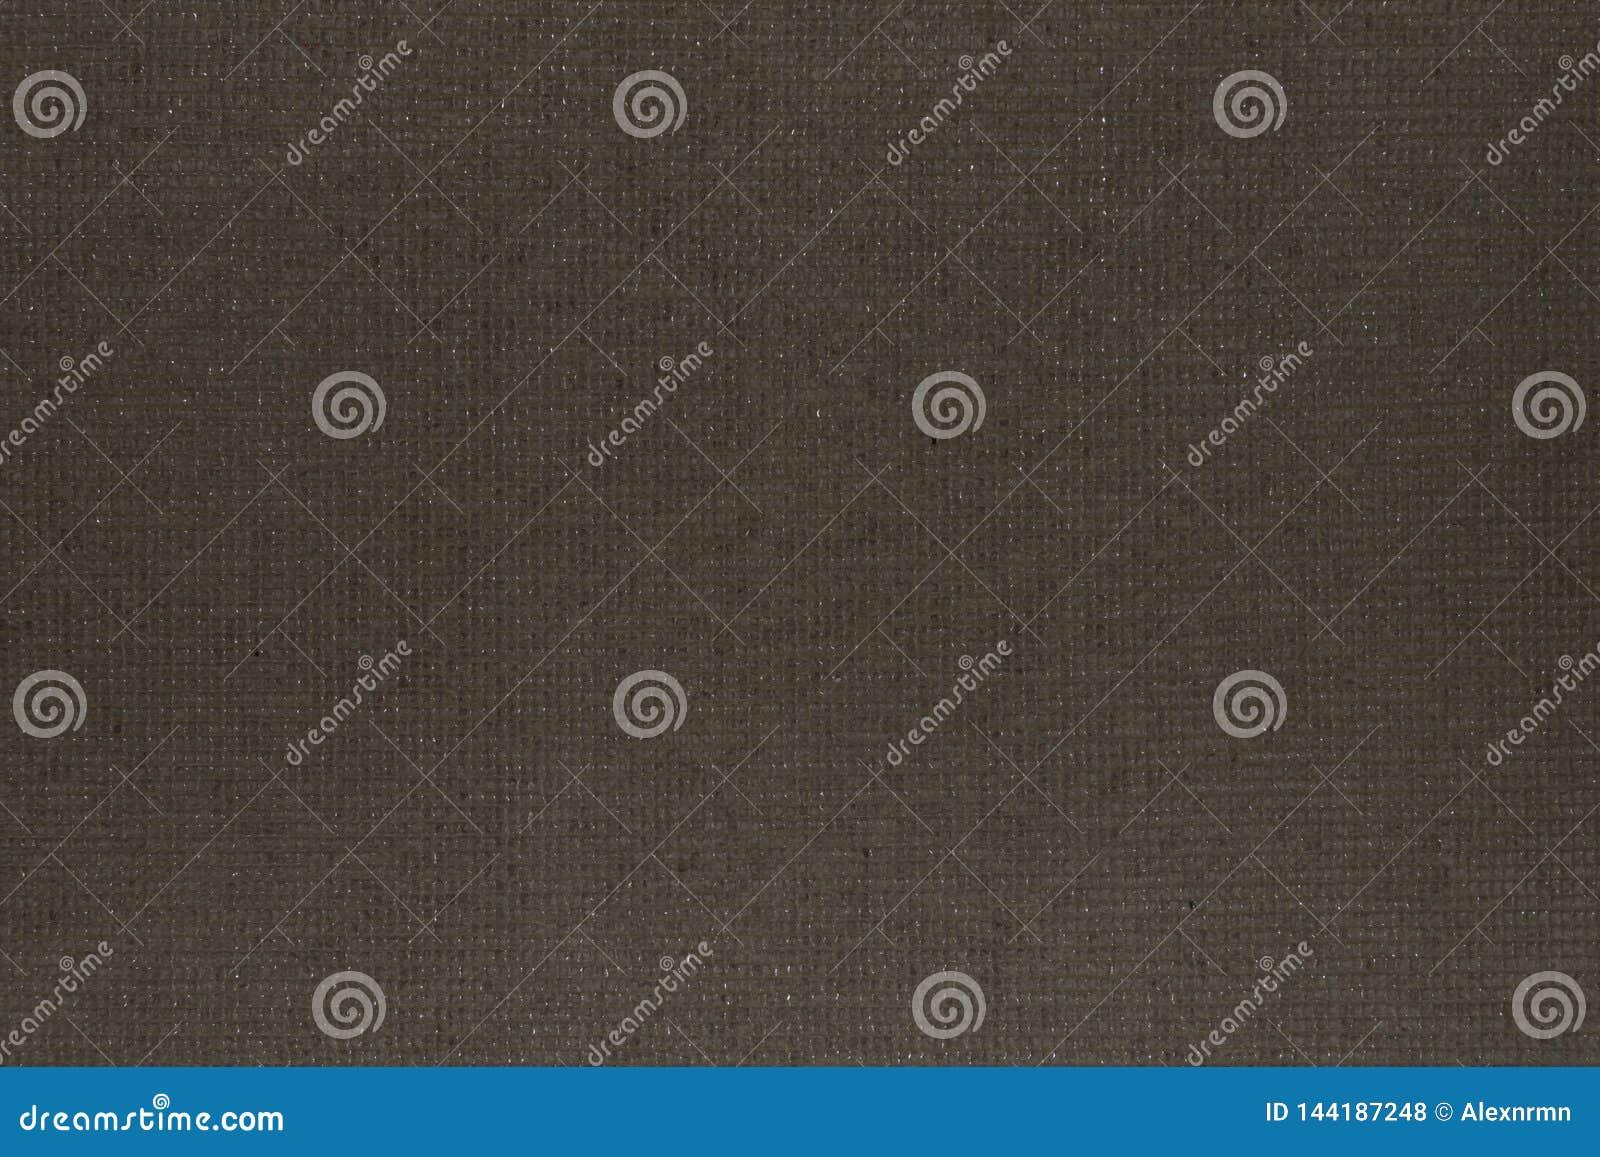 Bakgrund textur av basen av matta